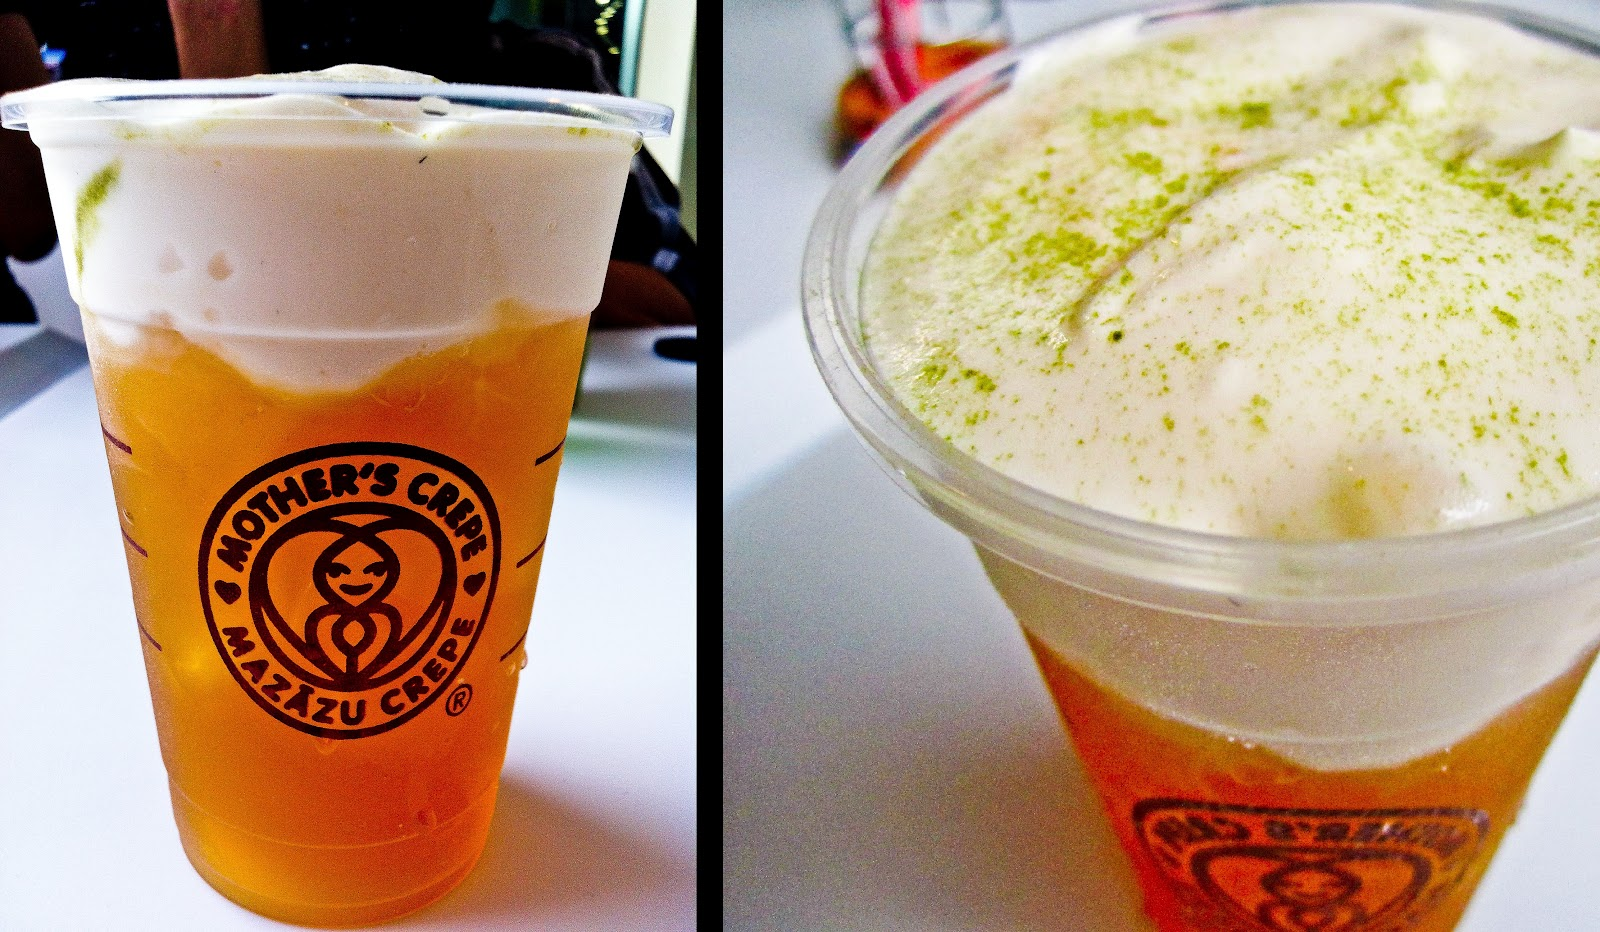 Mother's Crepe & Cafe (Mazazu Crepe) - SM Mall of Asia | BERYLLICIOUS...